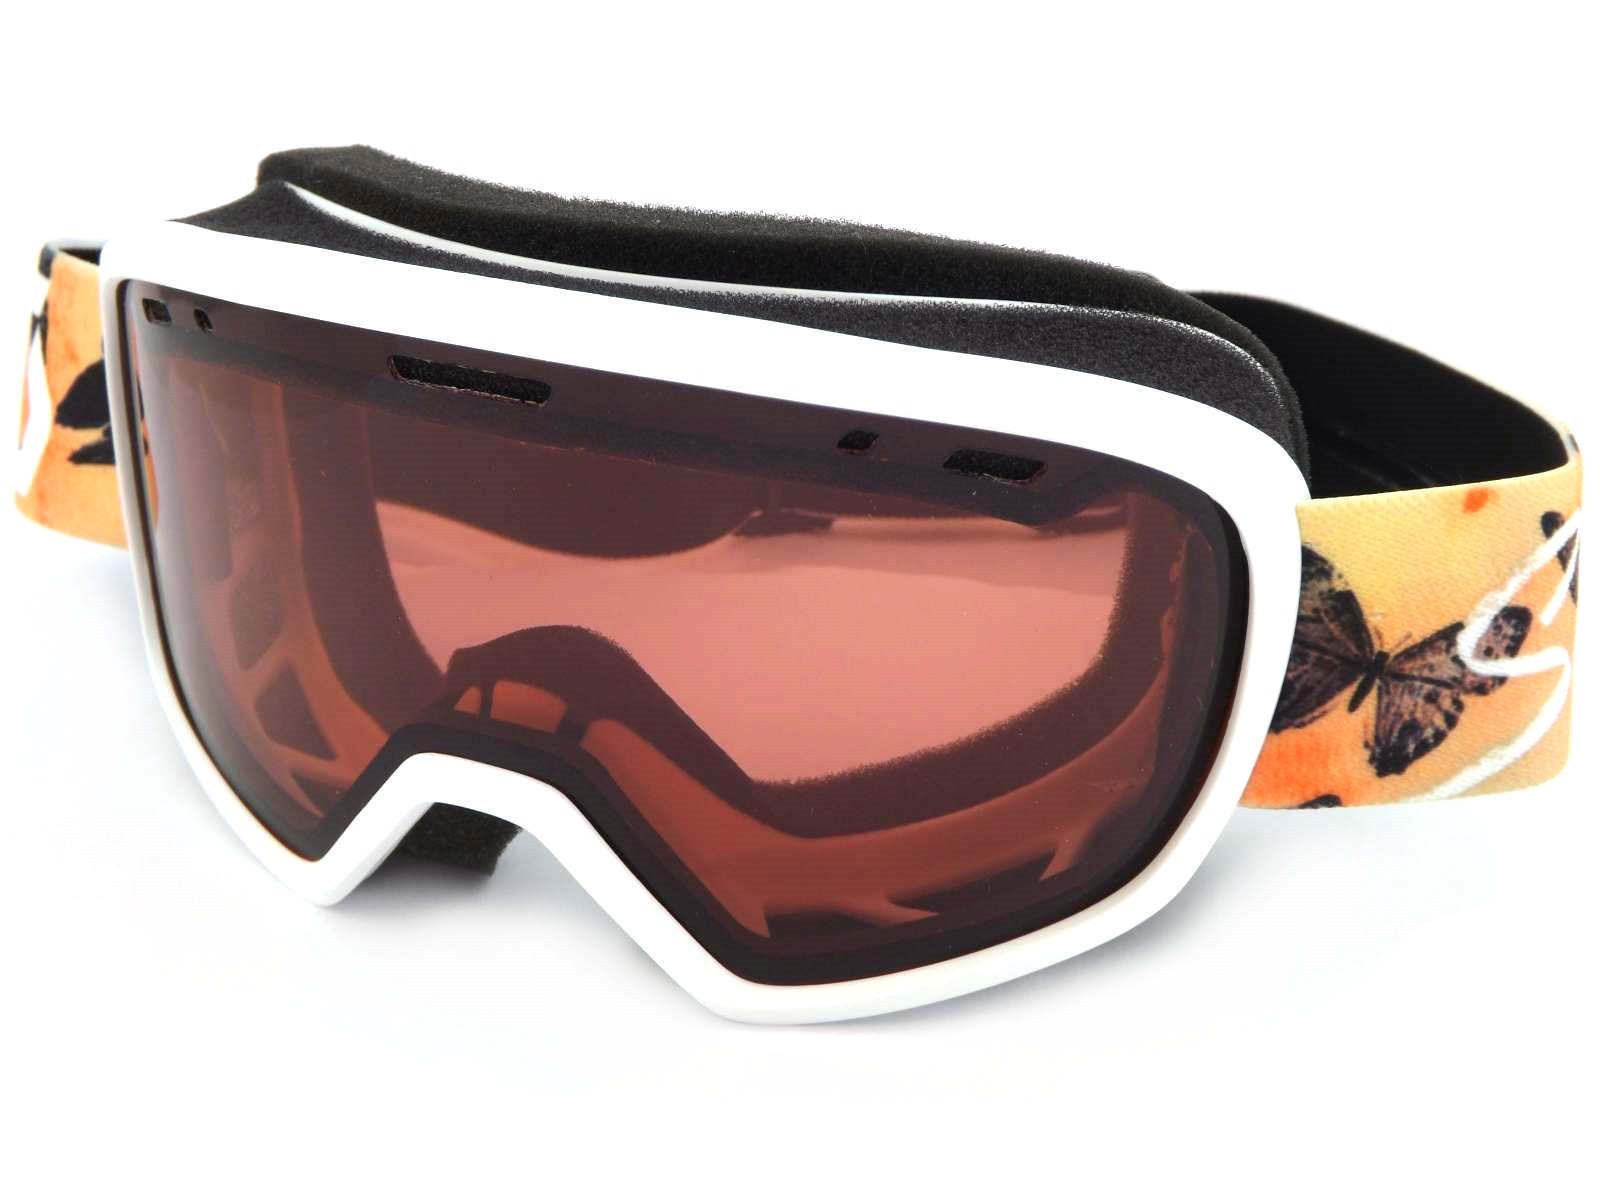 31d0556532 Scott Buzz Junior Ski Google In White Amplifier The Ski Shop £25.00